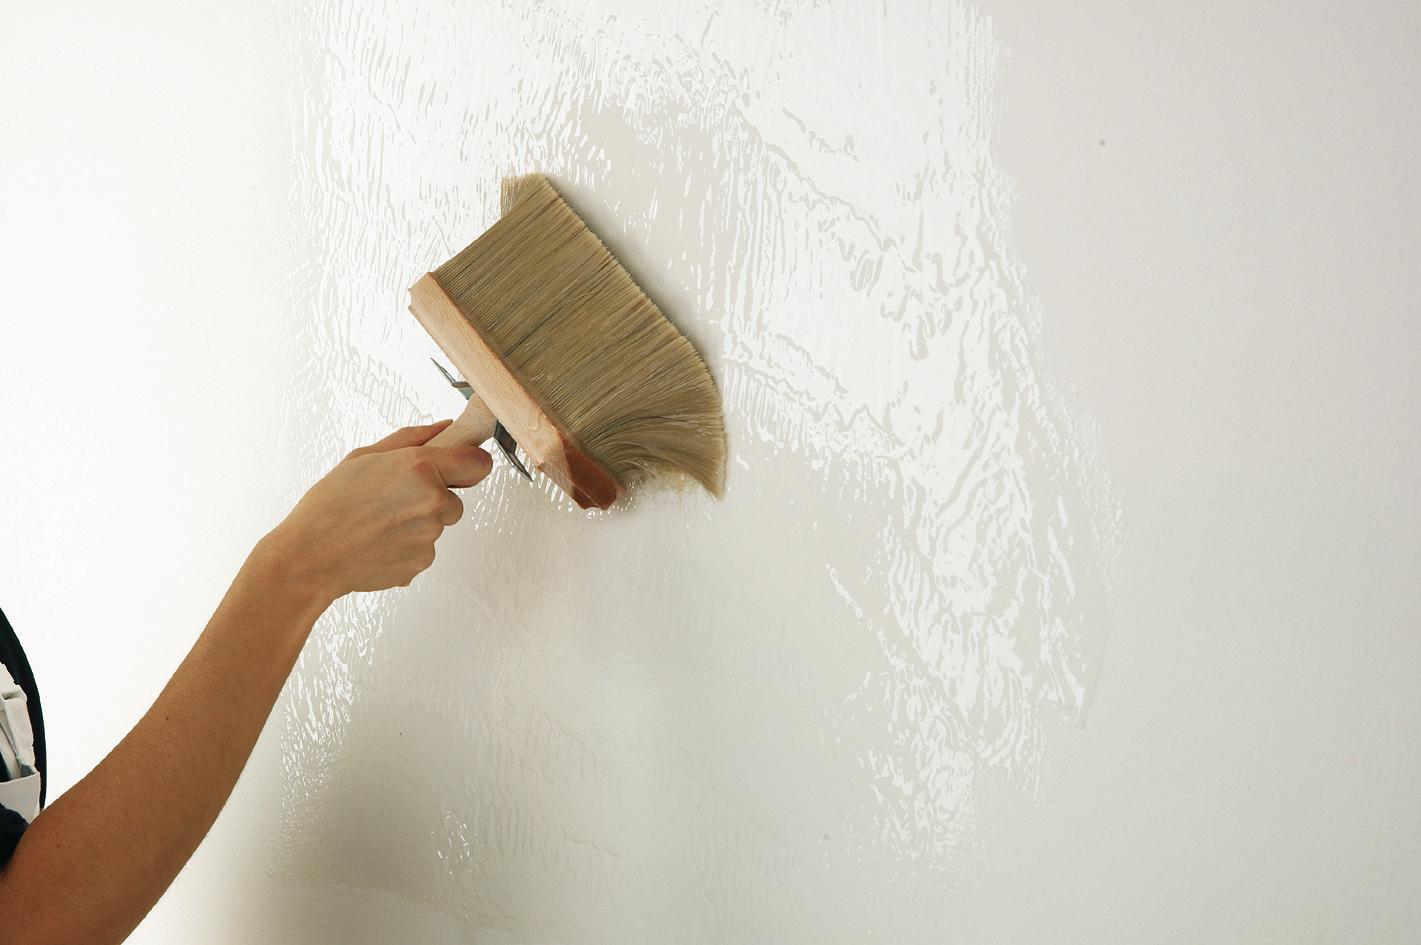 Грунтовка стен кисточкой